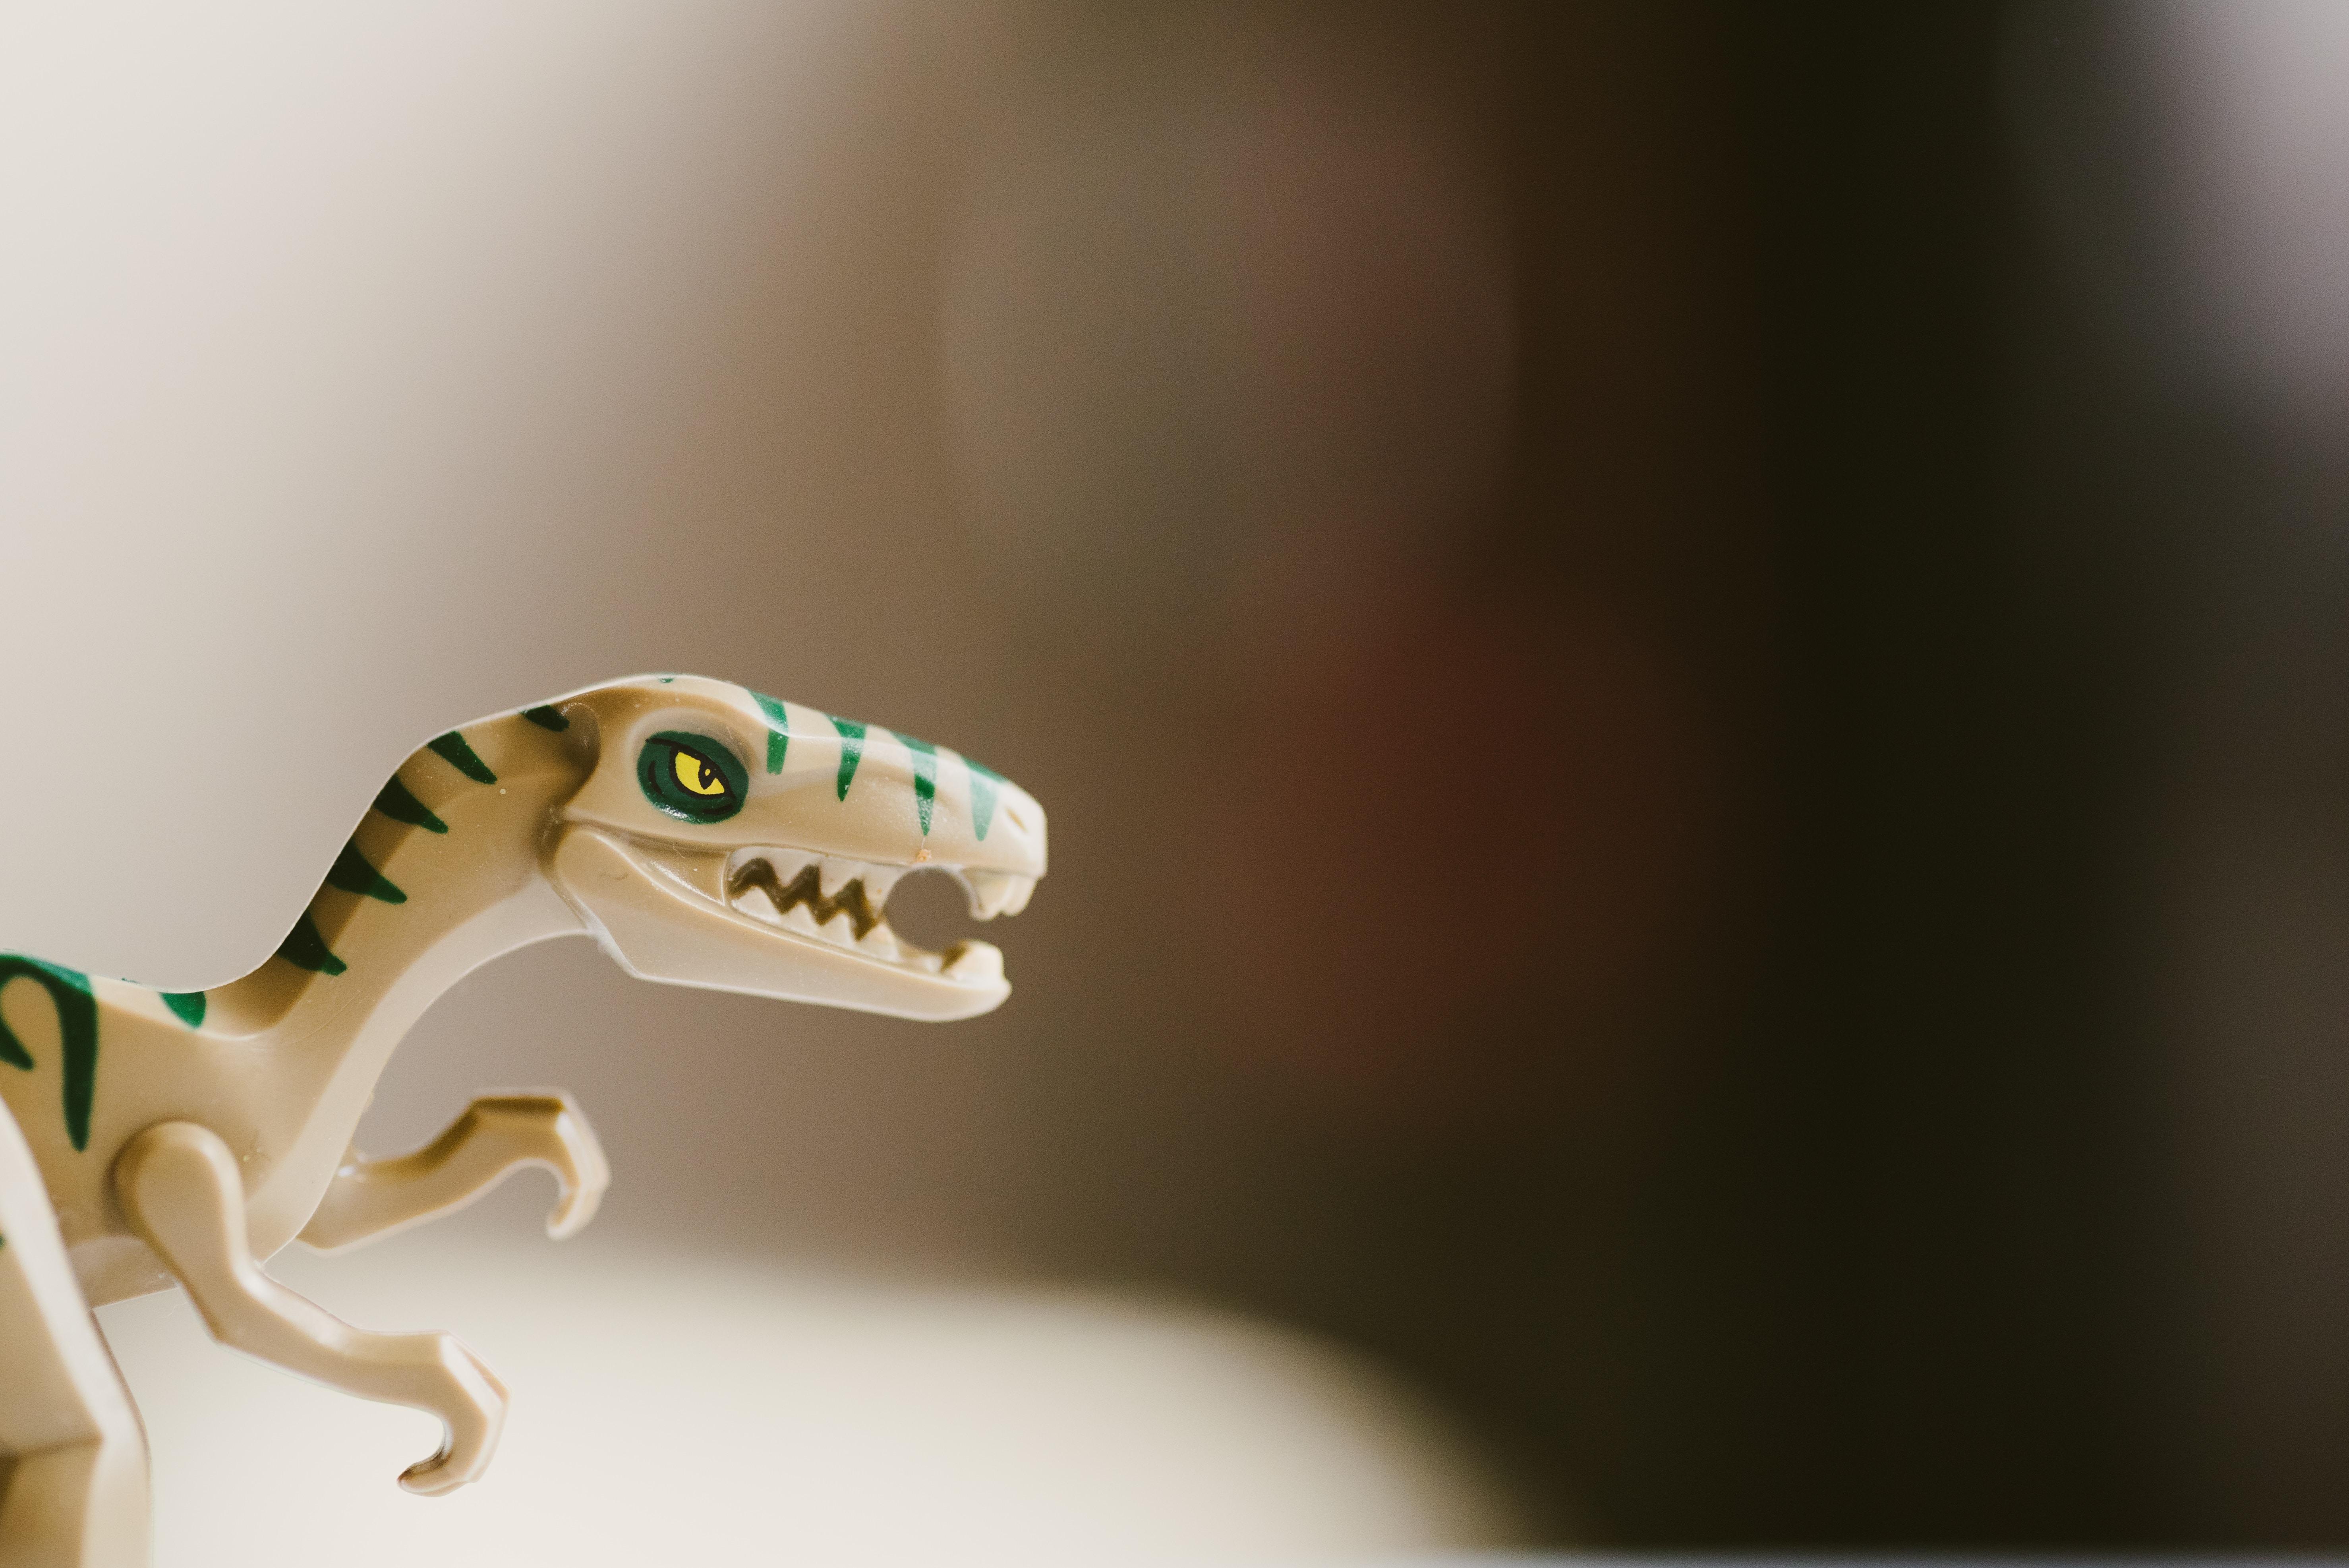 A toy dinosaur.